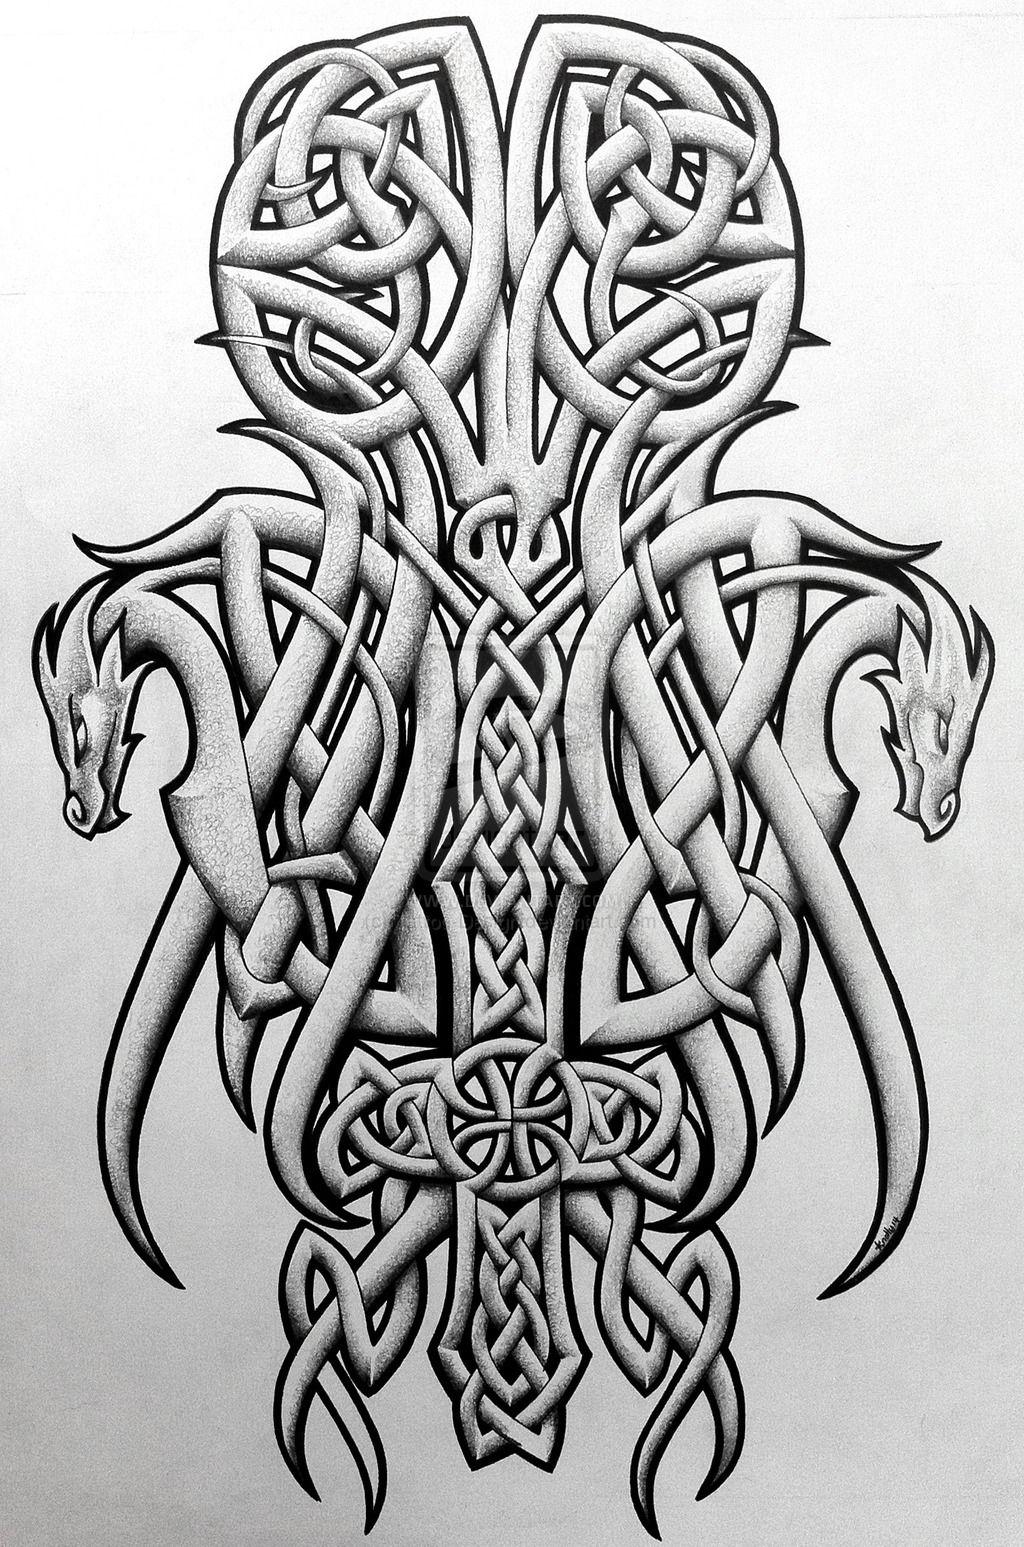 fe79424afd100 Celtic dragons and cross by Tattoo-Design.deviantart.com on @DeviantArt